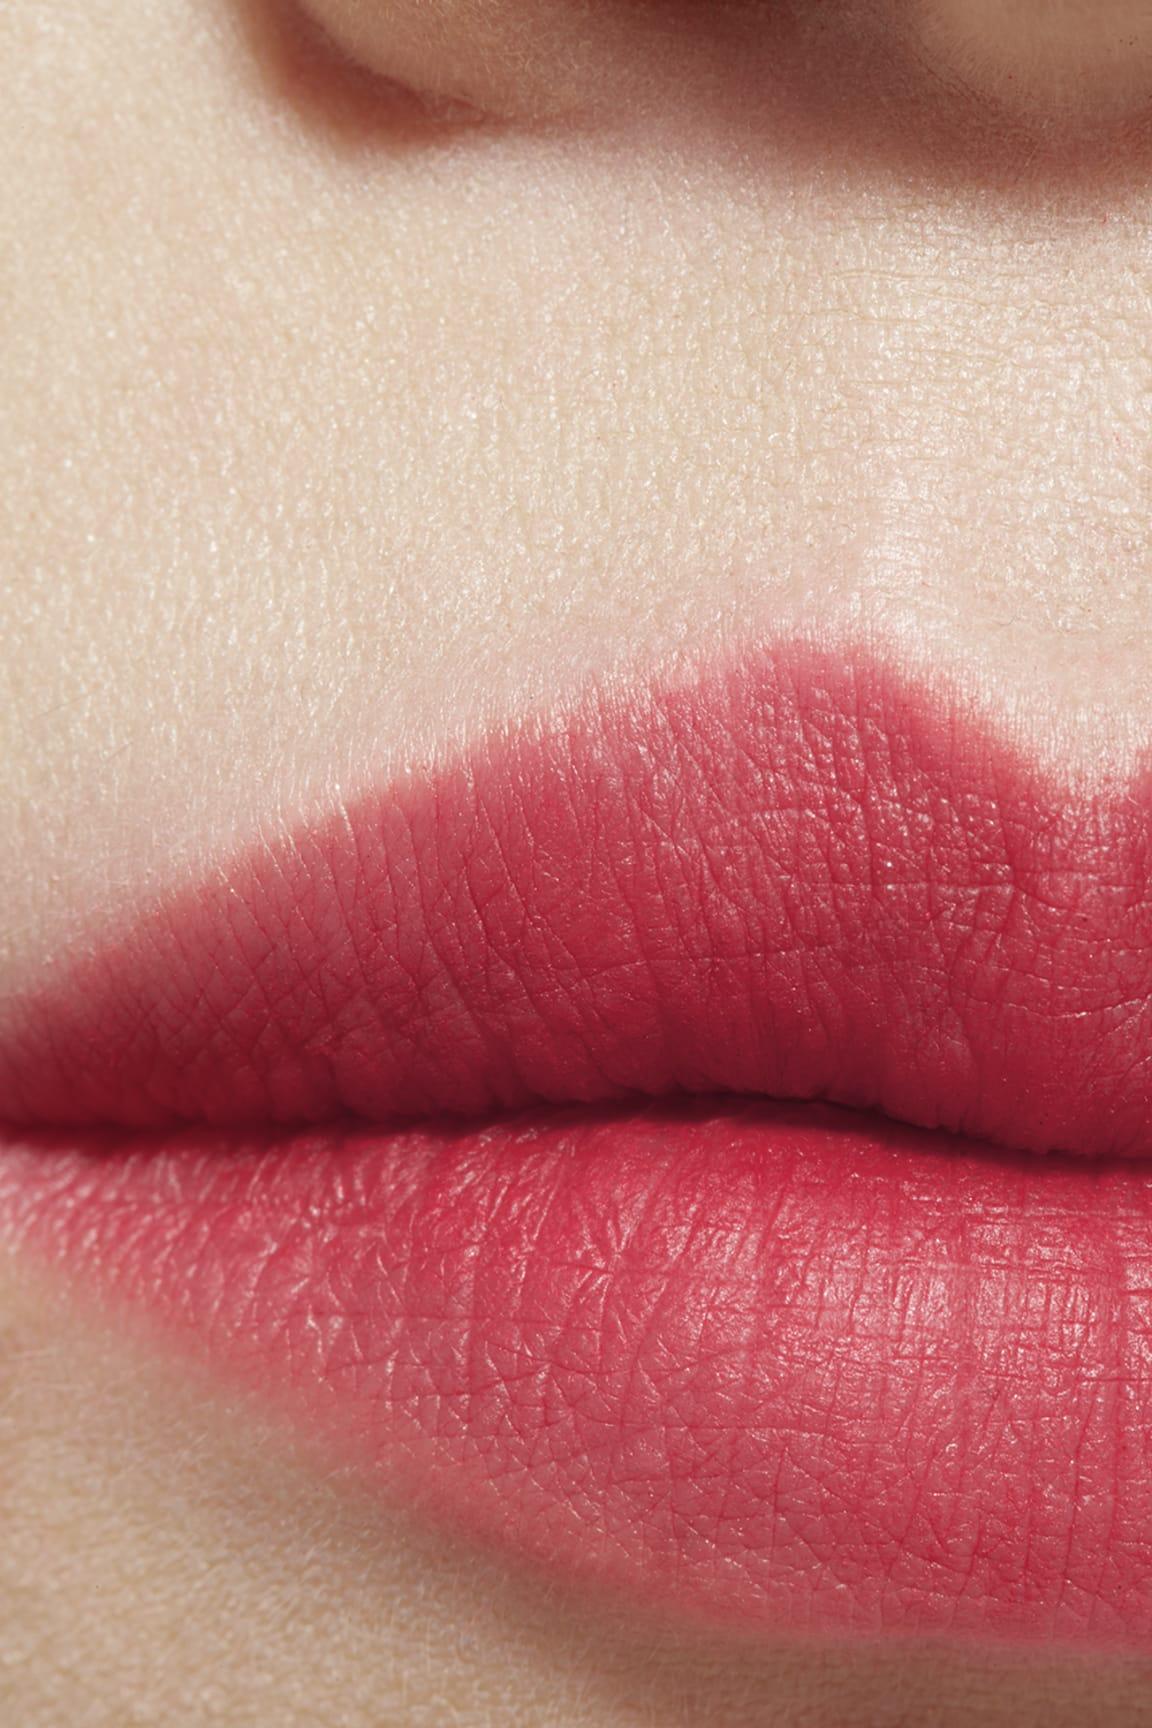 Application makeup visual 1 - ROUGE COCO LIP BLUSH 416 - TEASING PINK